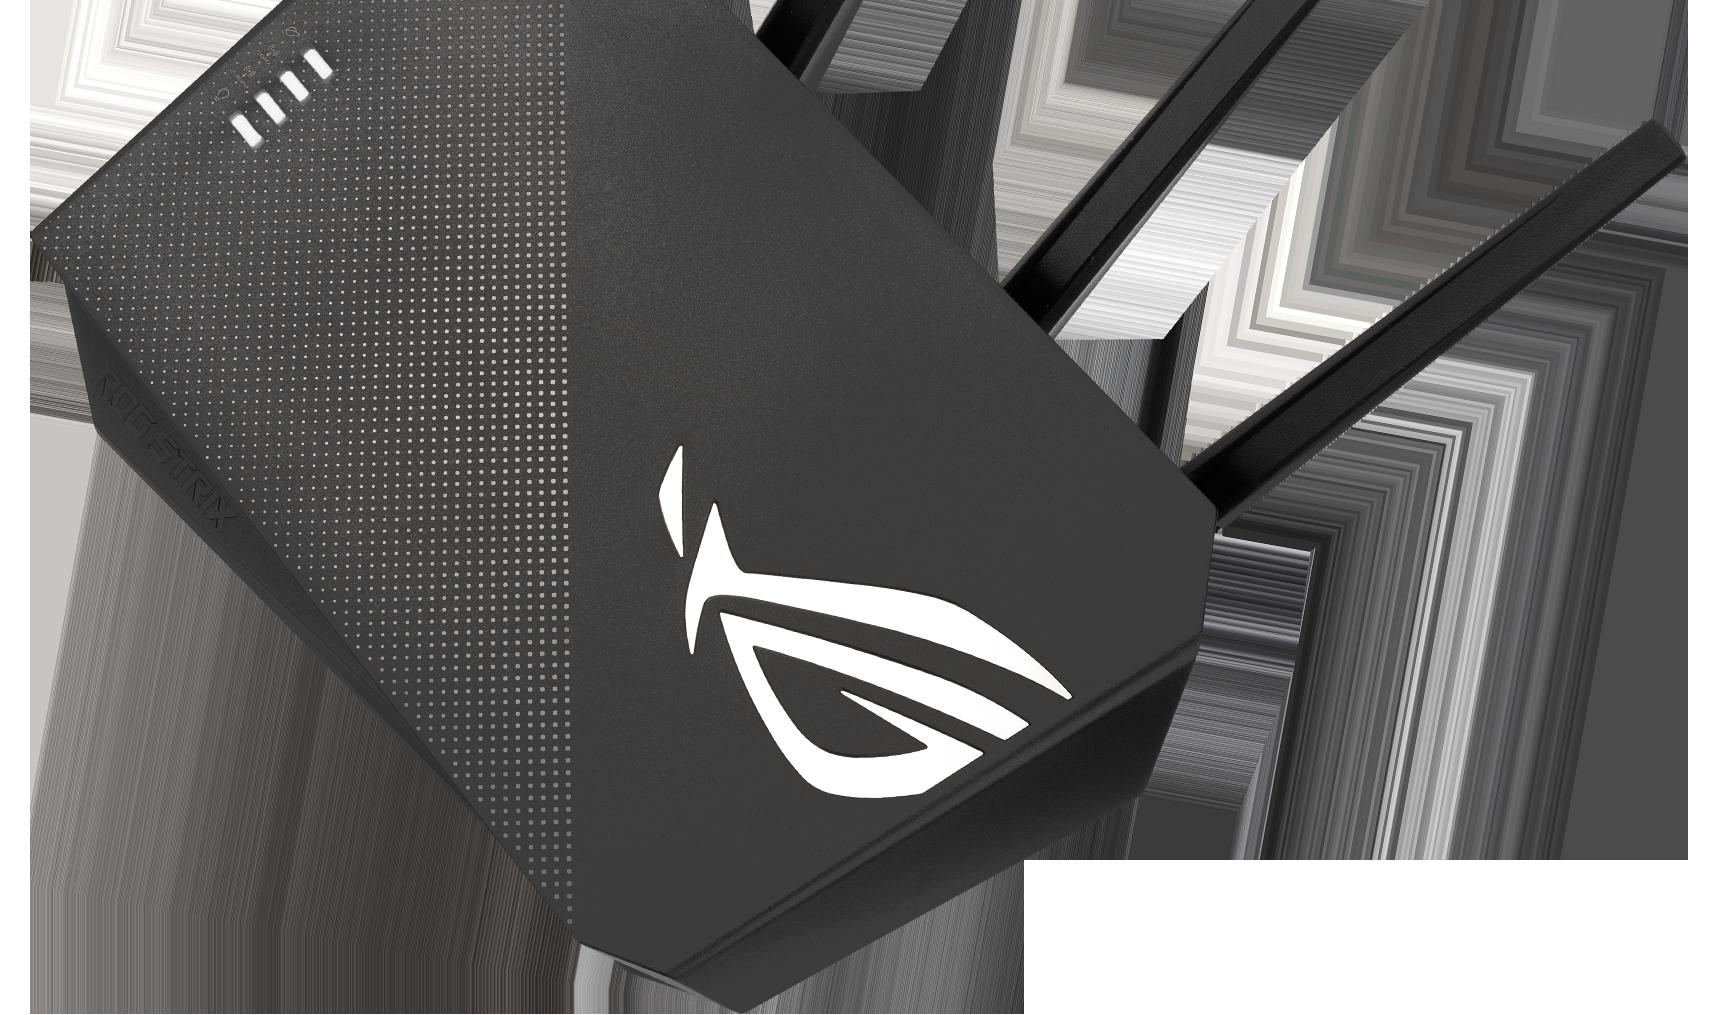 ROG-Strix-GS-AX3000-network-security